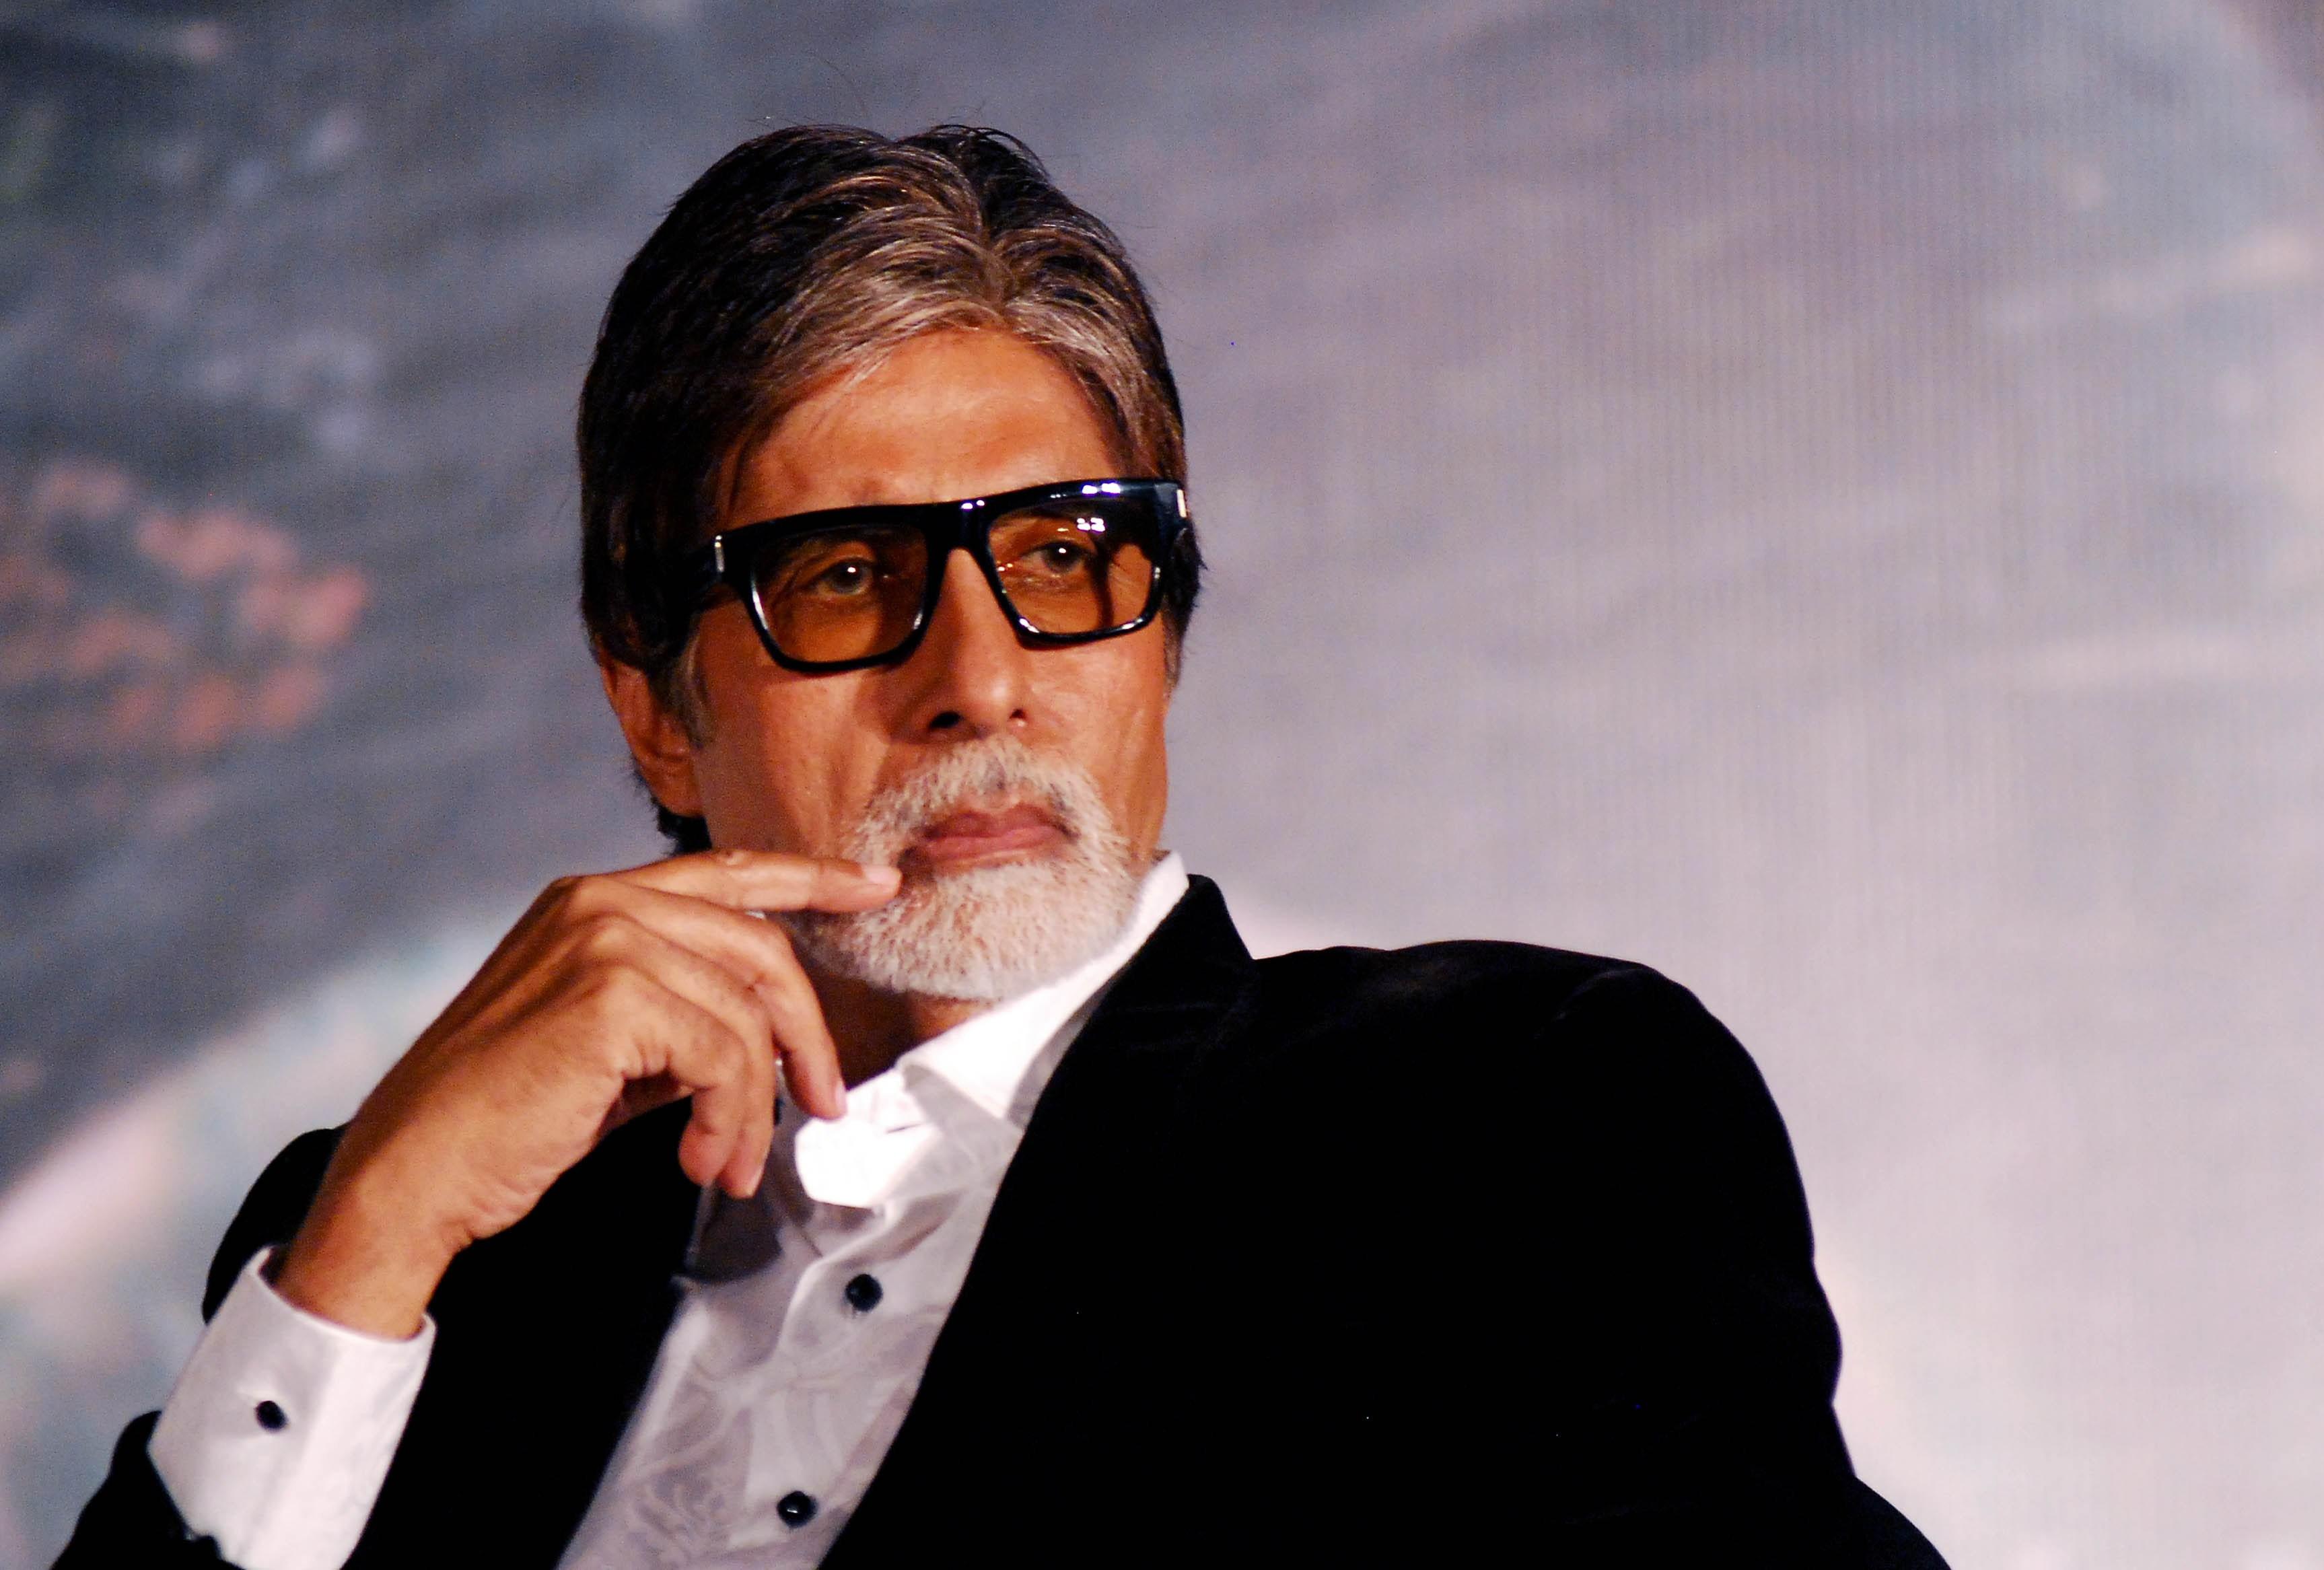 Amitabh Bachchan Wallpapers